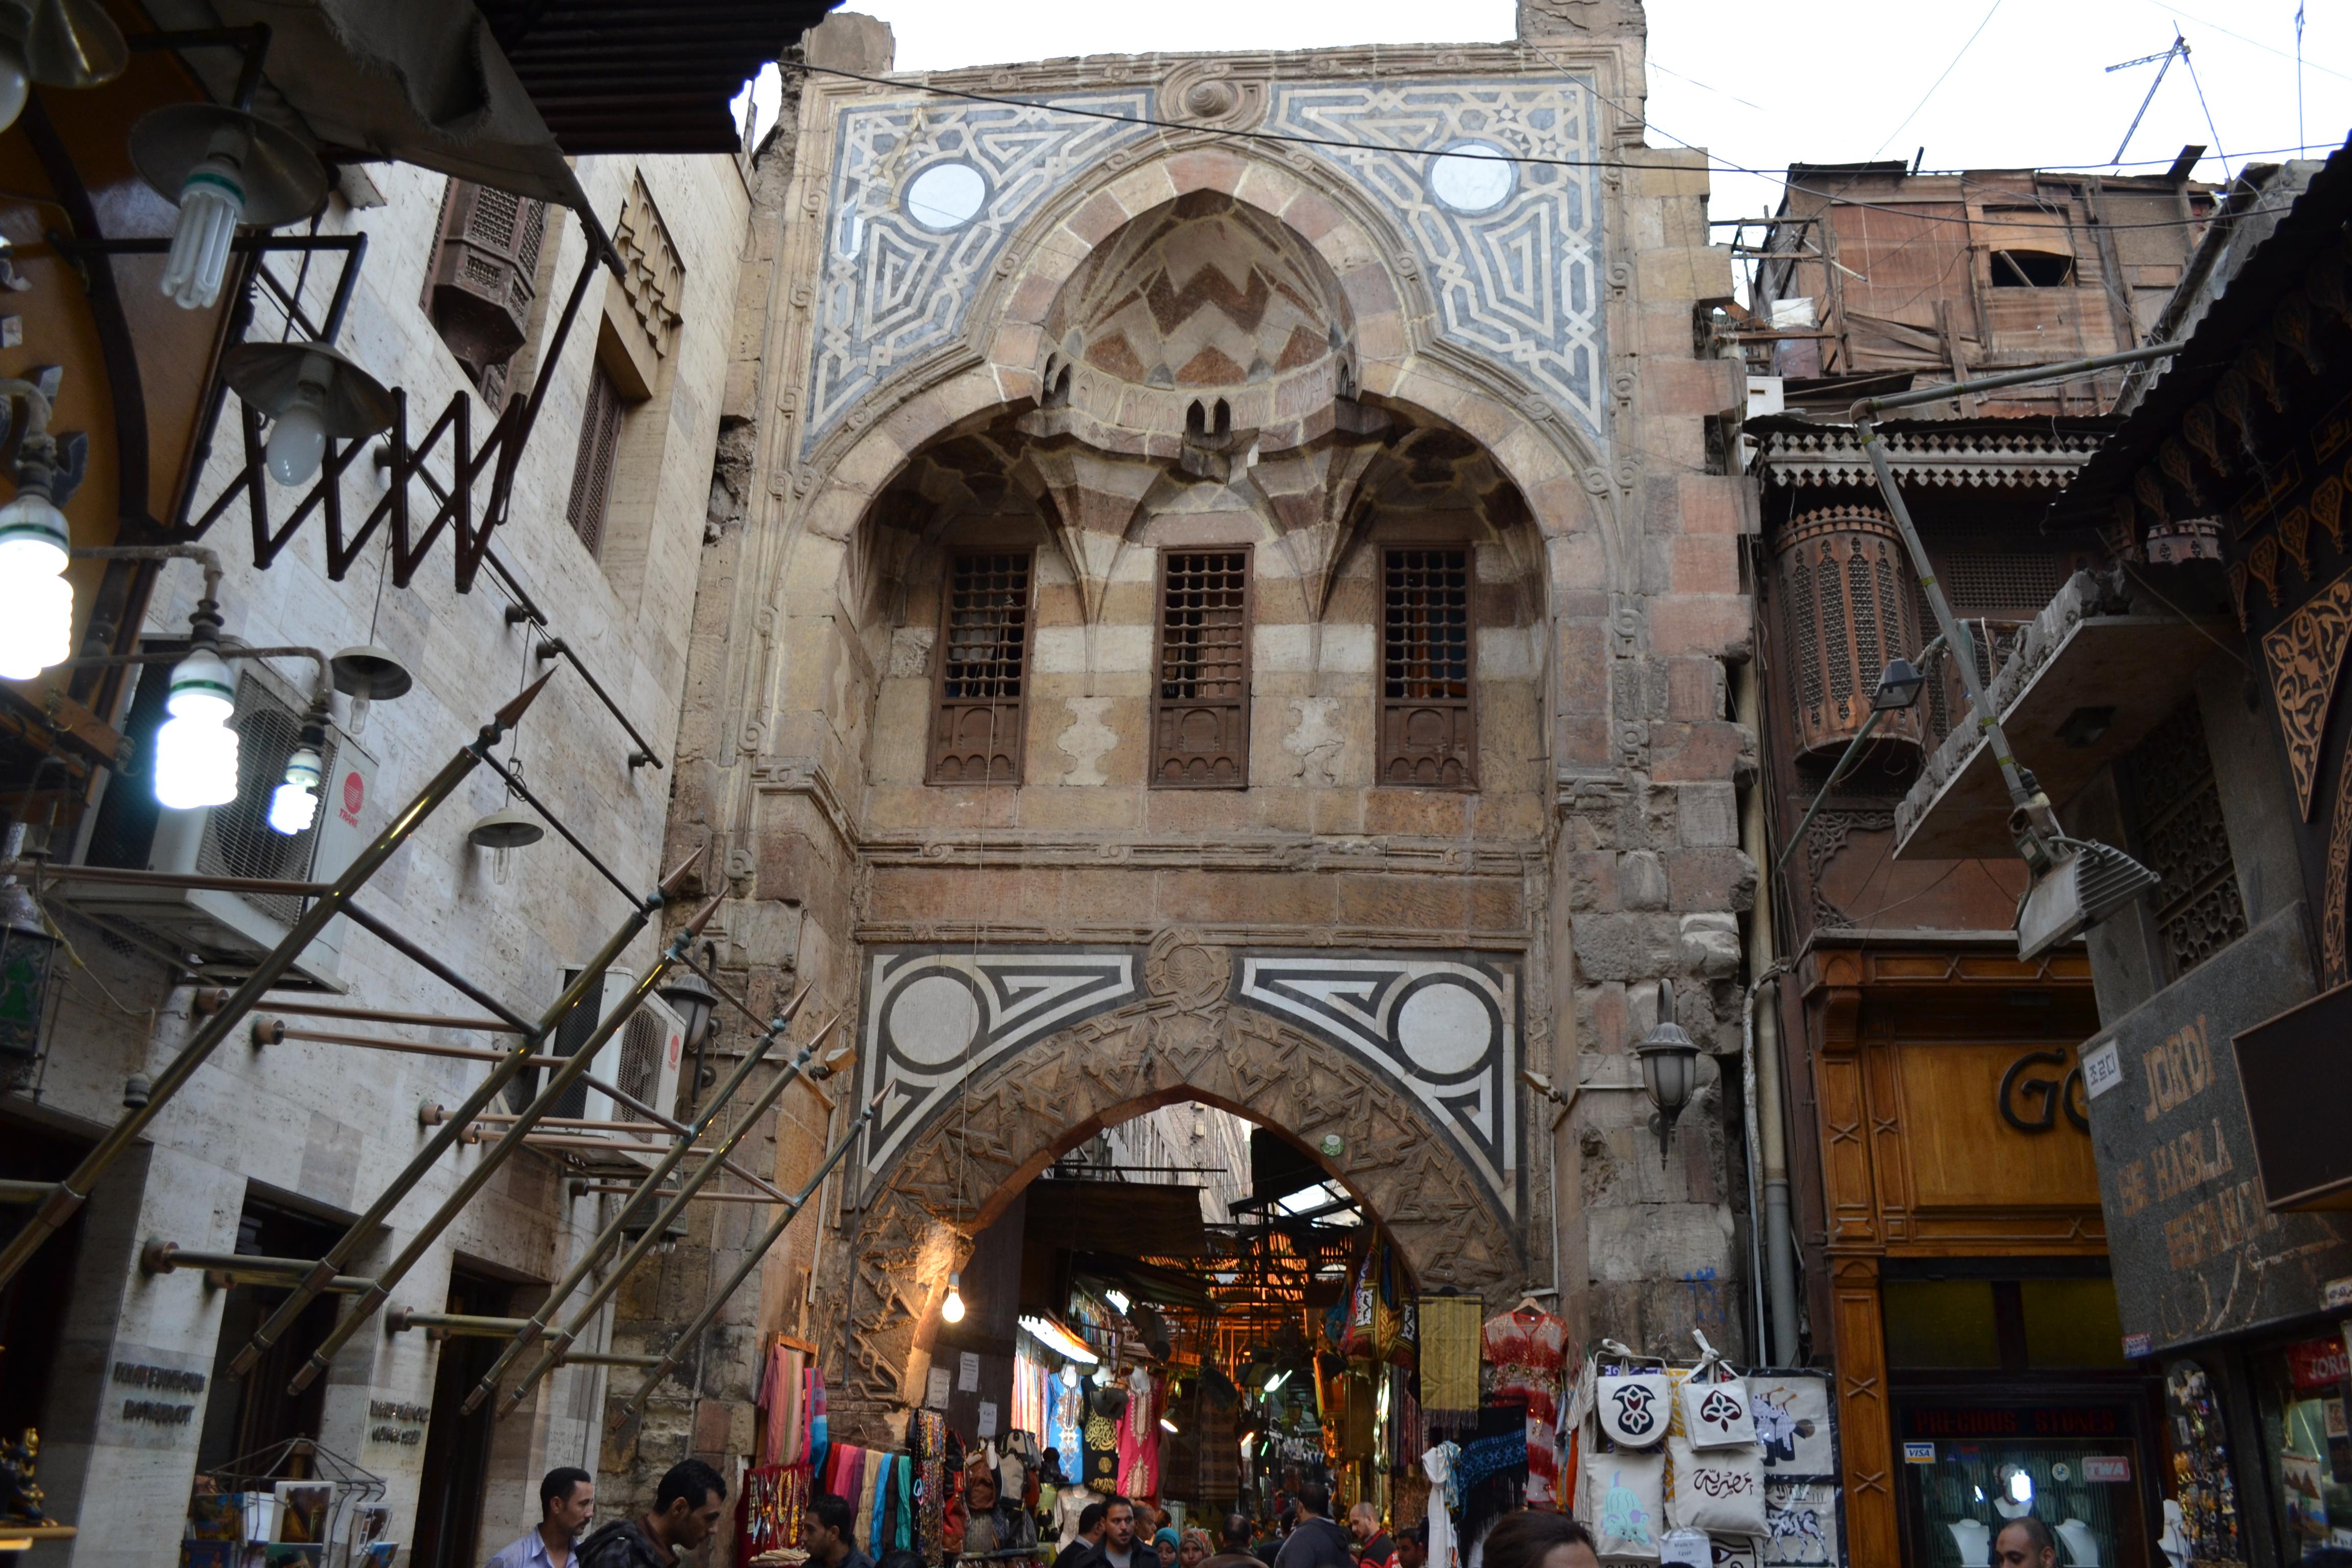 One of the many historical Islamic buildings in Khan El-Khalili